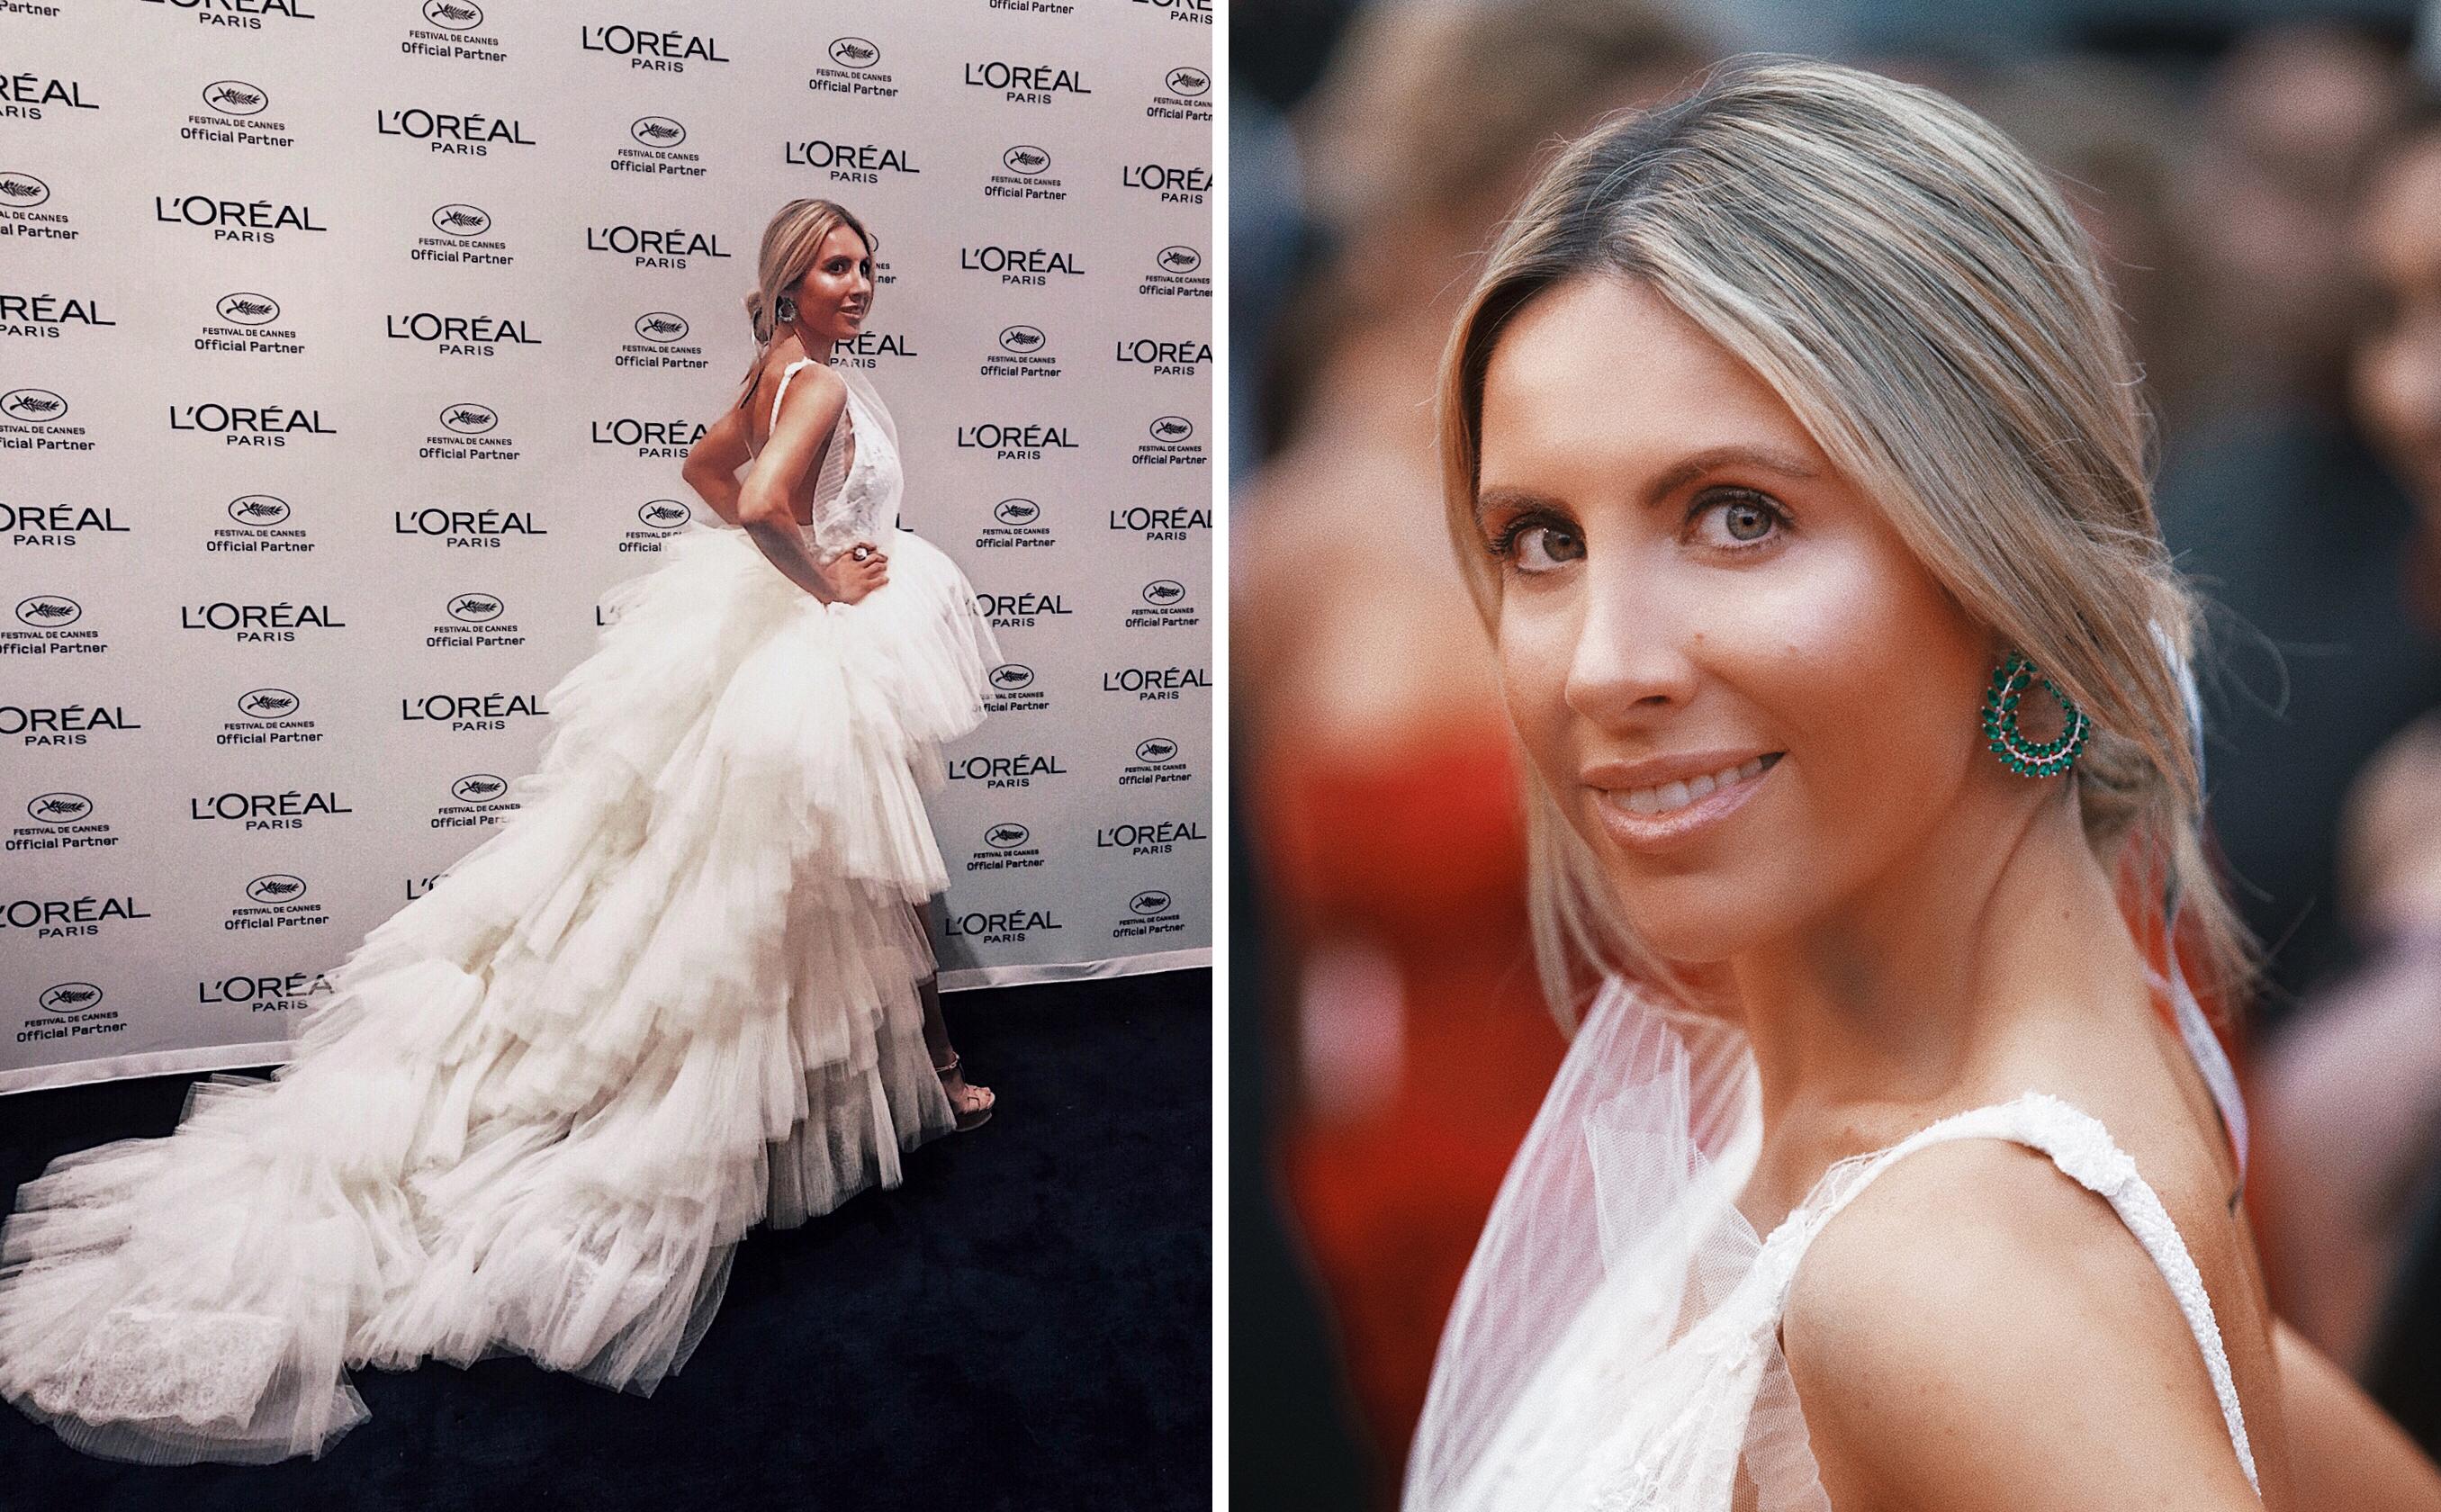 Cannes-Film-Festival-Loreal-Paris-Monica-Sors-2018